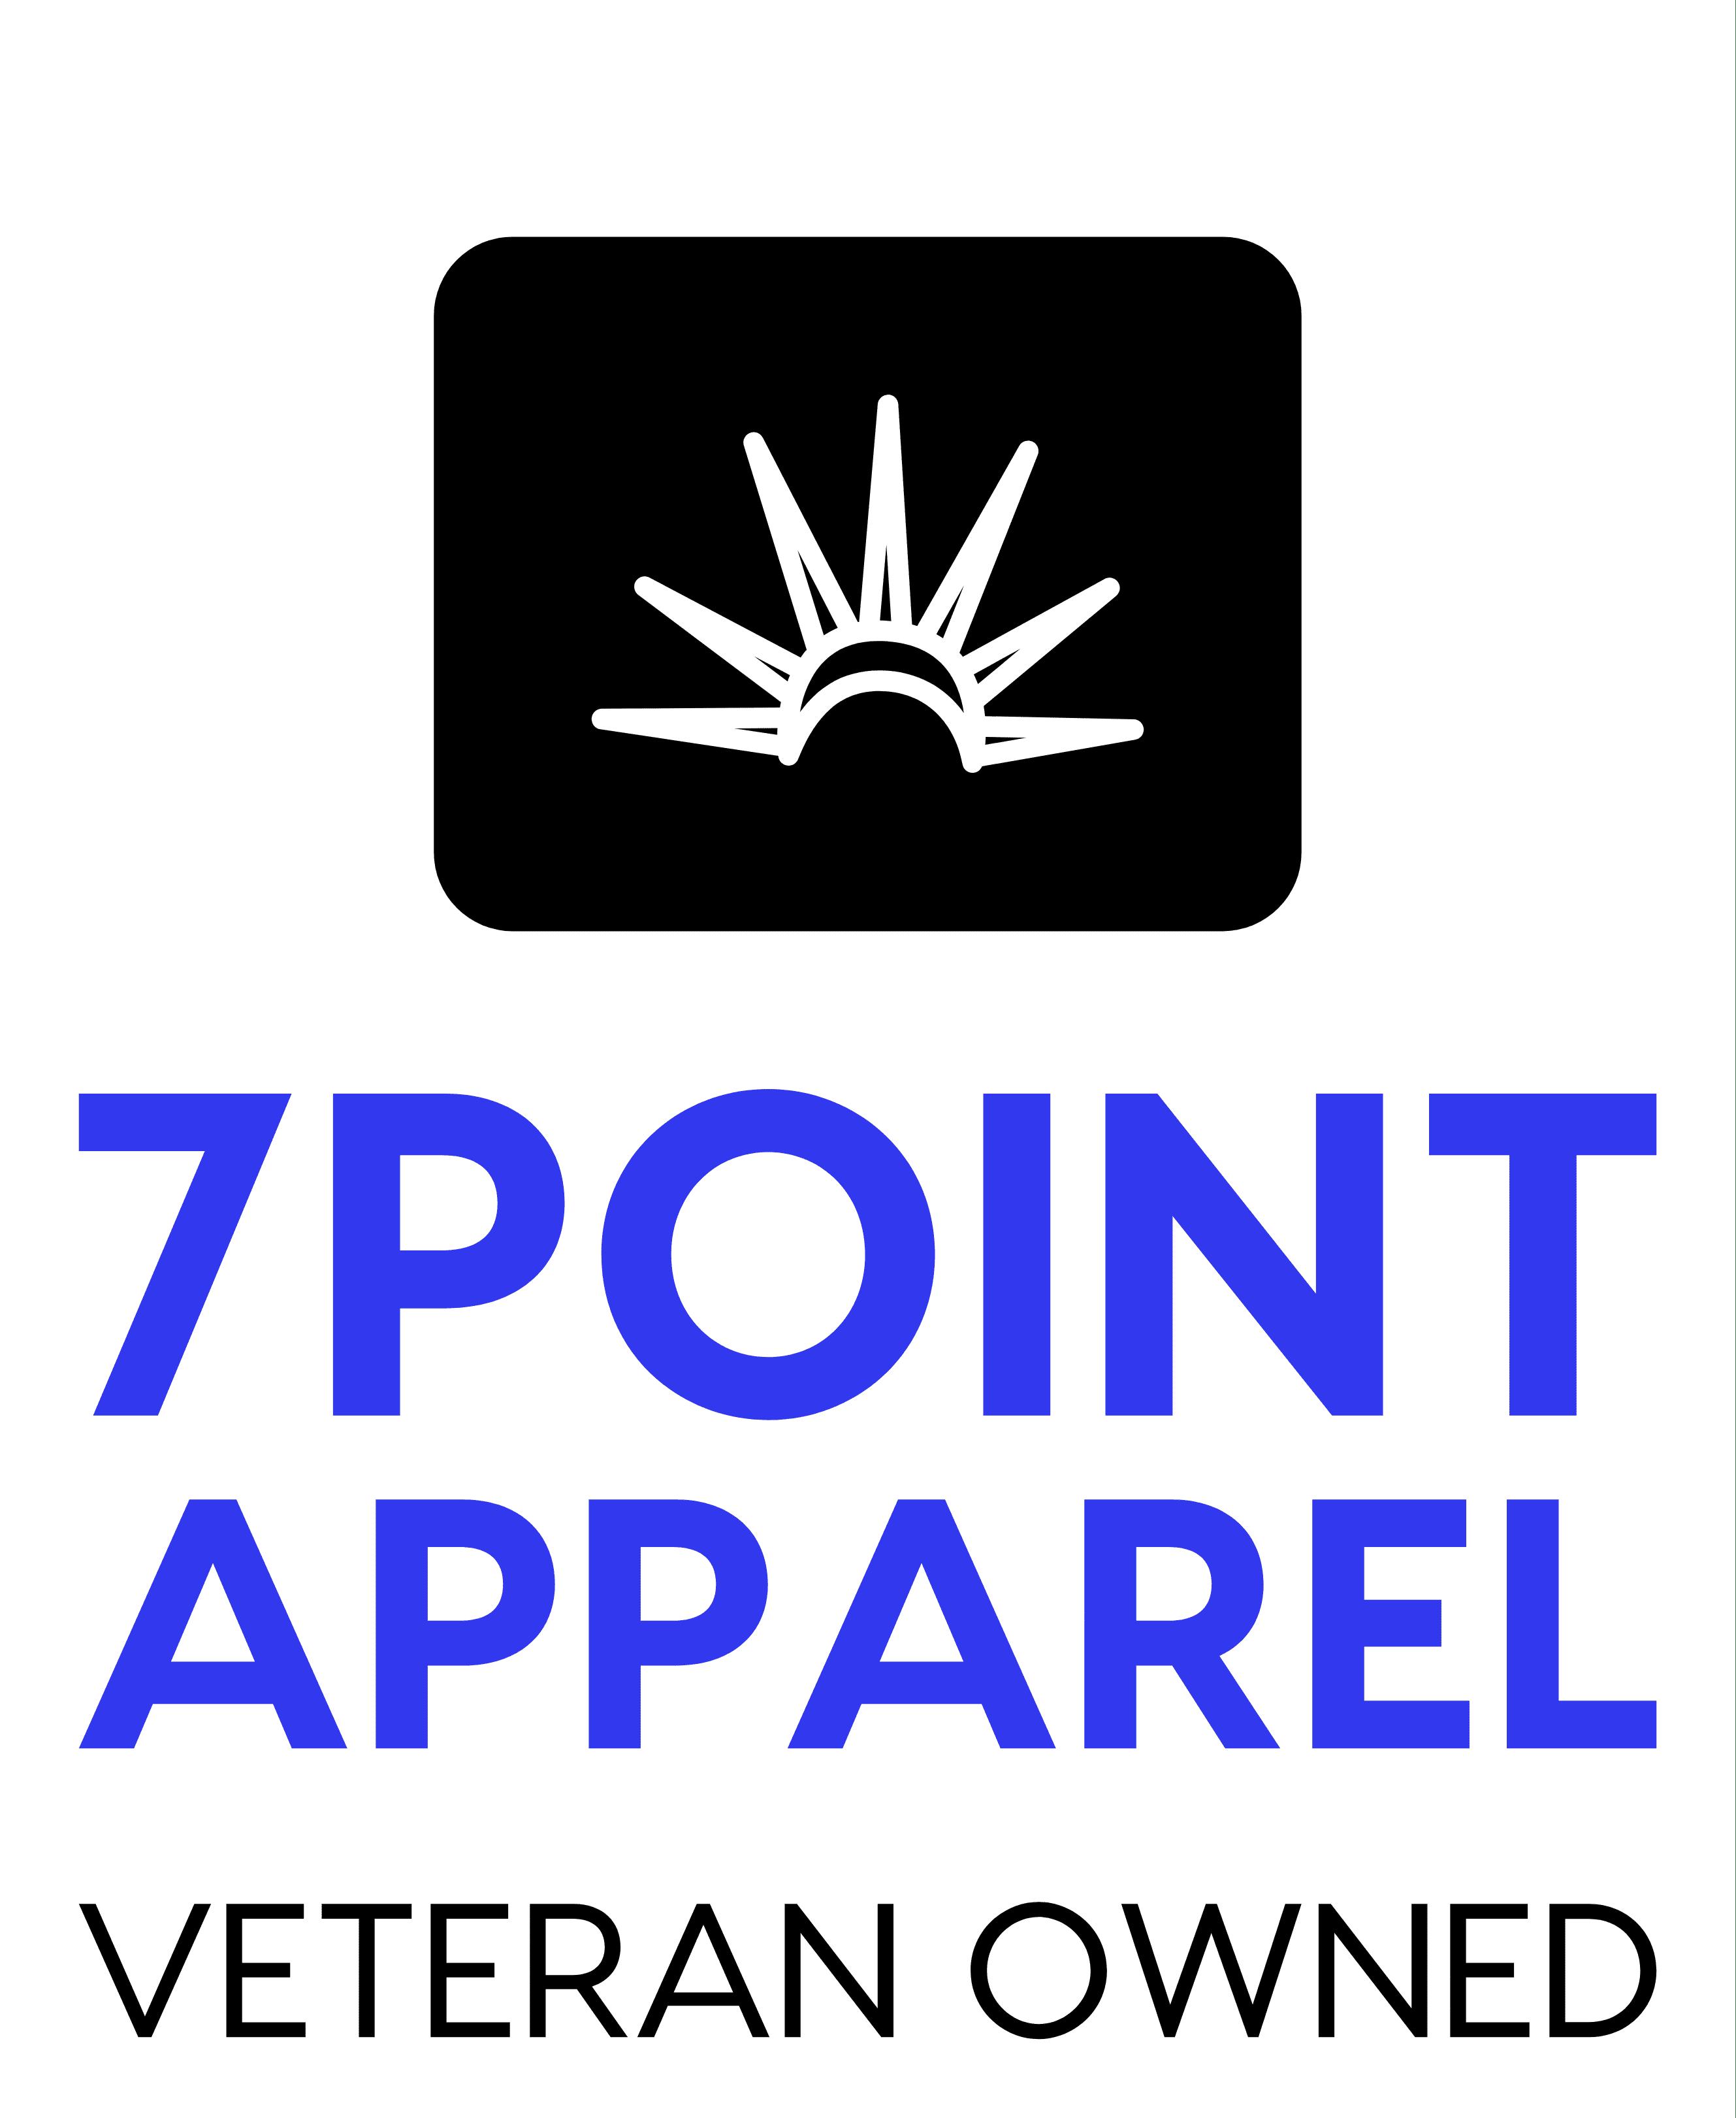 7Point Apparel